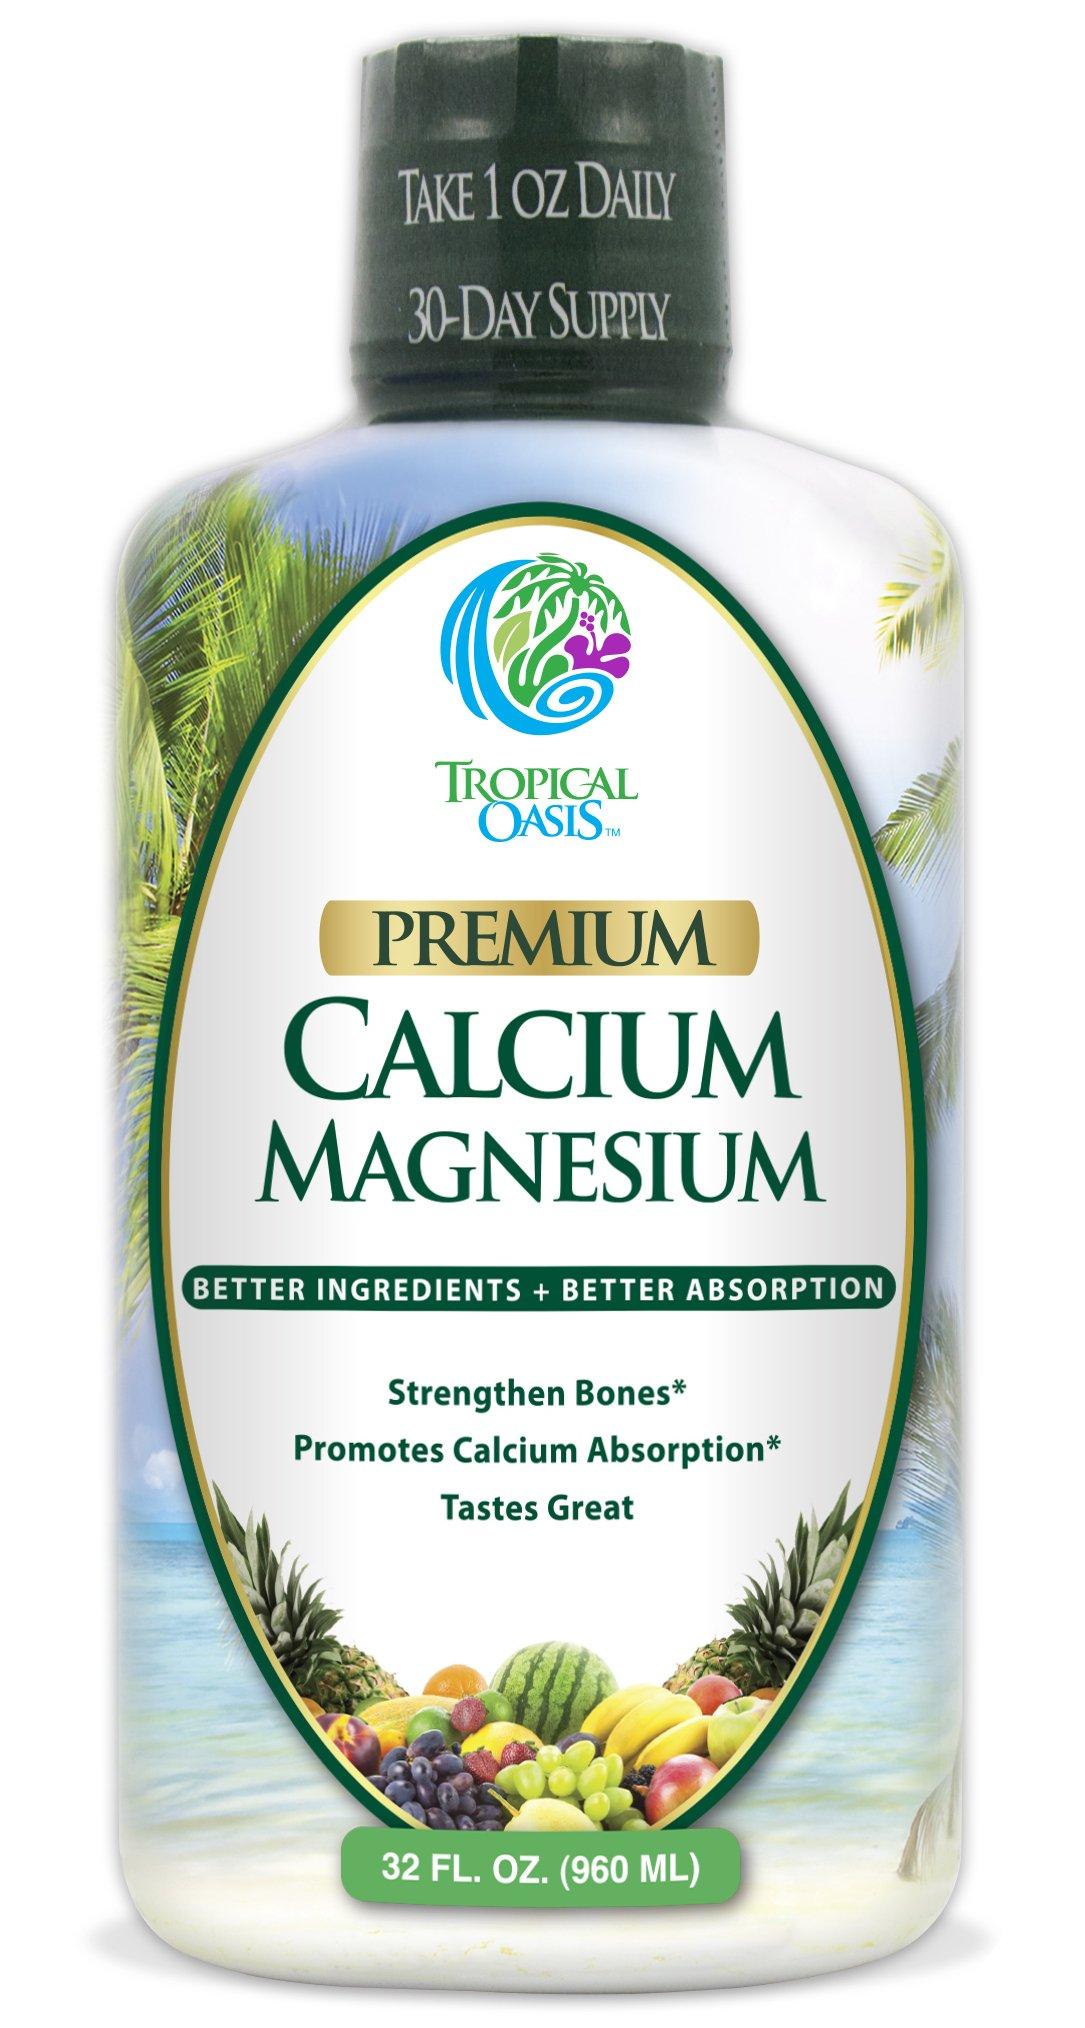 Tropical Oasis Liquid Calcium & Magnesium - Natural formula w/ support for strong bones - Liquid vitamins w/ calcium, magnesium & vitamin D - Up to 96% absorption by the body. - 32oz, 64 Serv.